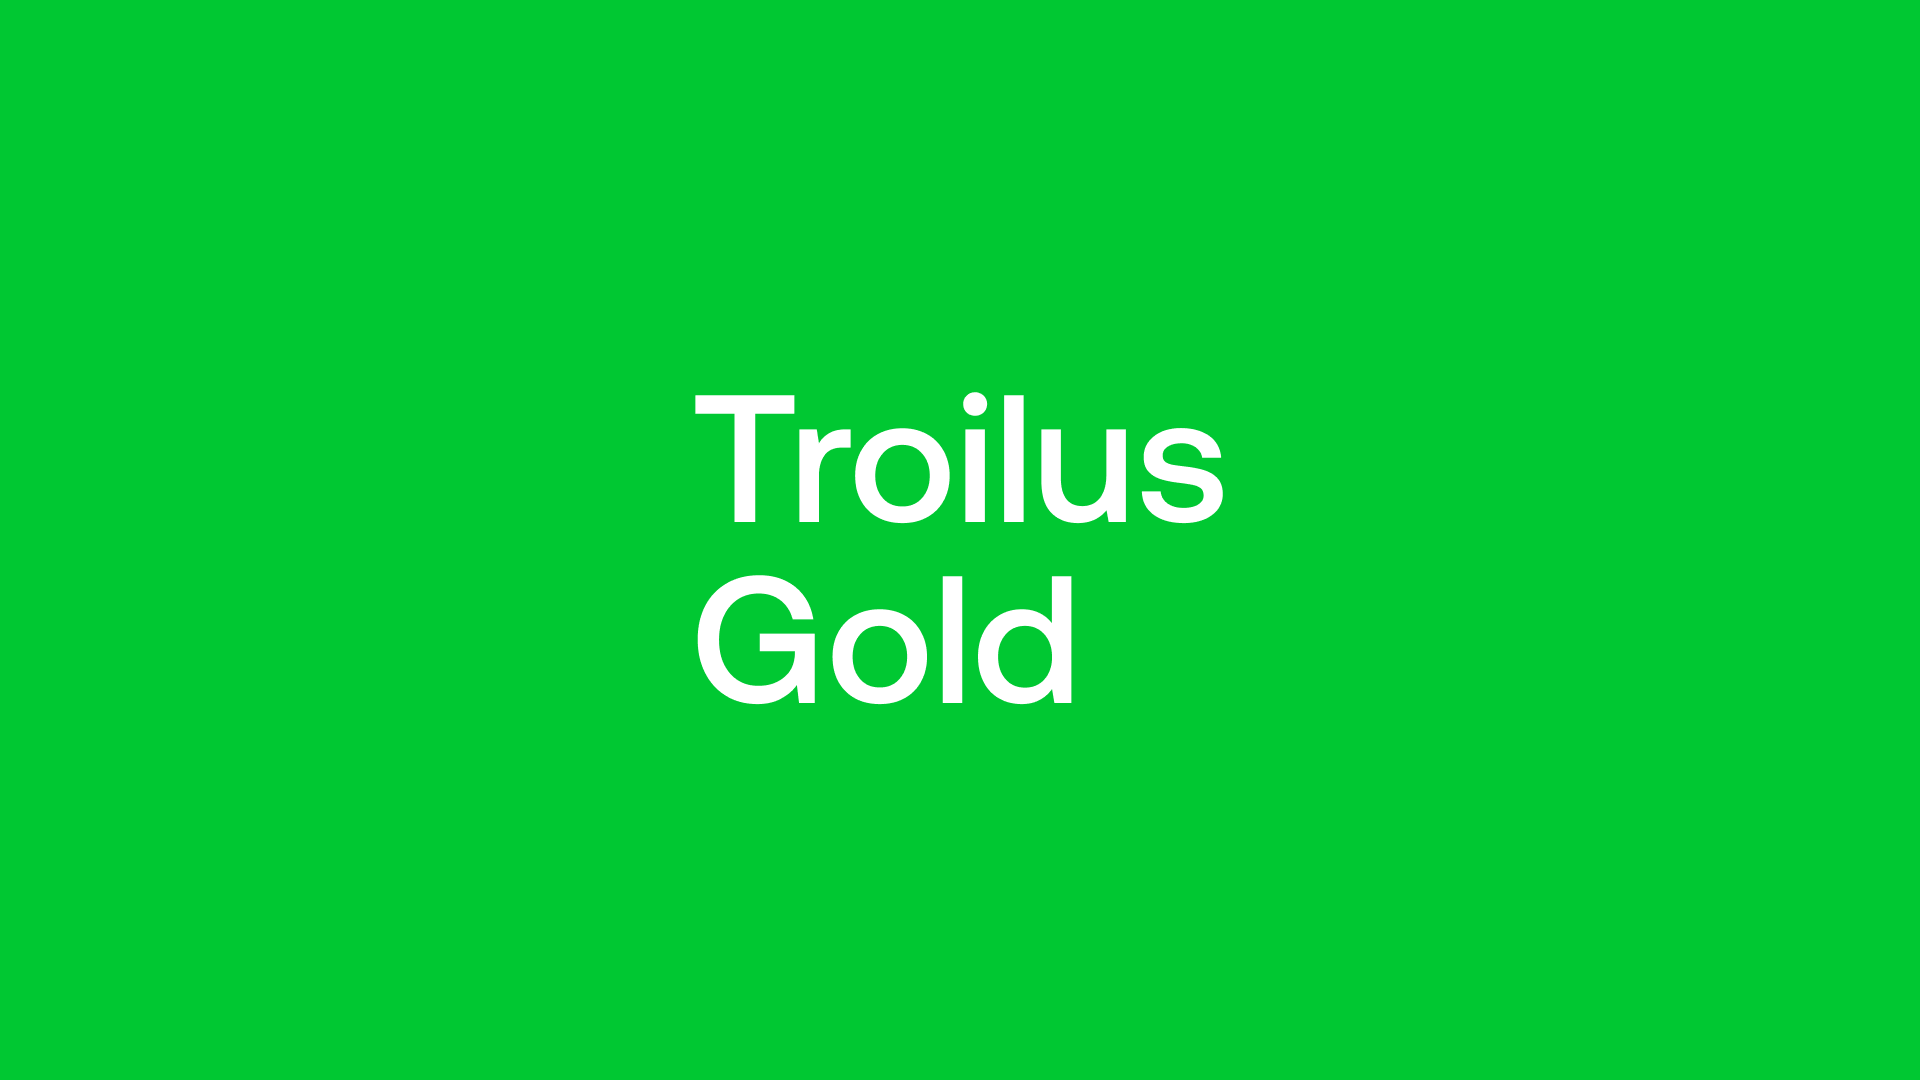 Troilus Gold (TLG) - Reawakening 6.5Moz Gold & Copper Beast